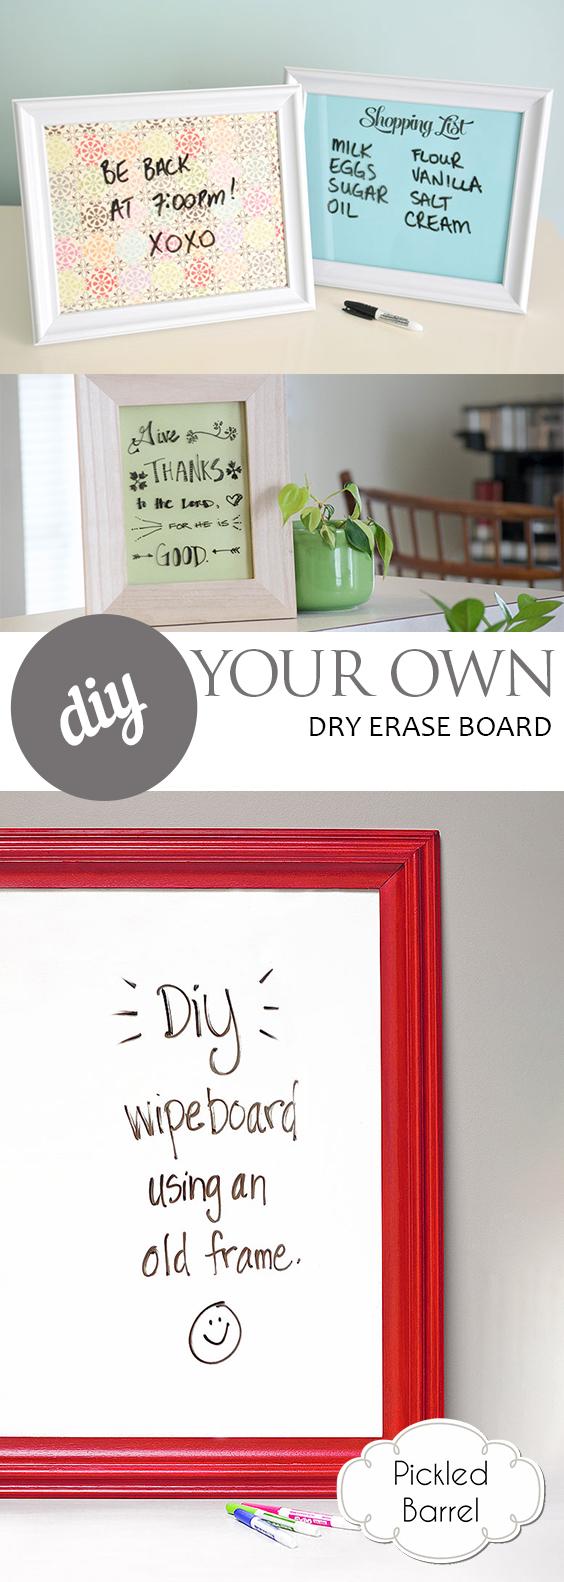 DIY Your Own Dry Erase Board| DIY, DIY Home, DIY Home Projects, Dry Erase Board, DIY Dry Erase Board, DIY Tutorials, Easy DIY Tutorials, Simple Tutorials for the Home, Popular Pin #DIYHome #DIYDryEraseBoard